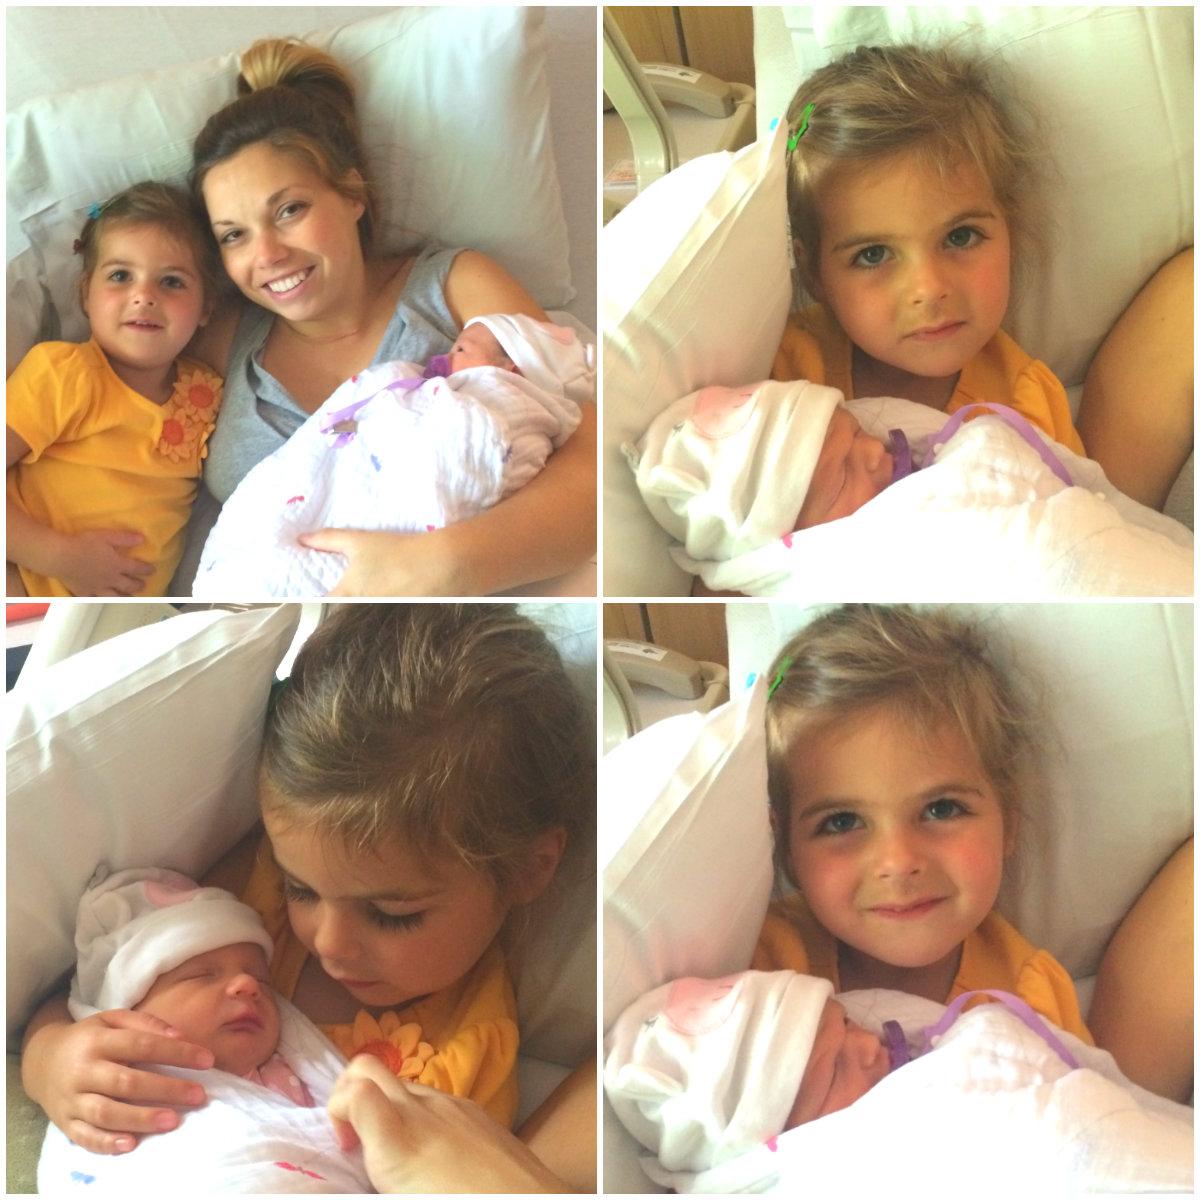 Beau visiting her sisters